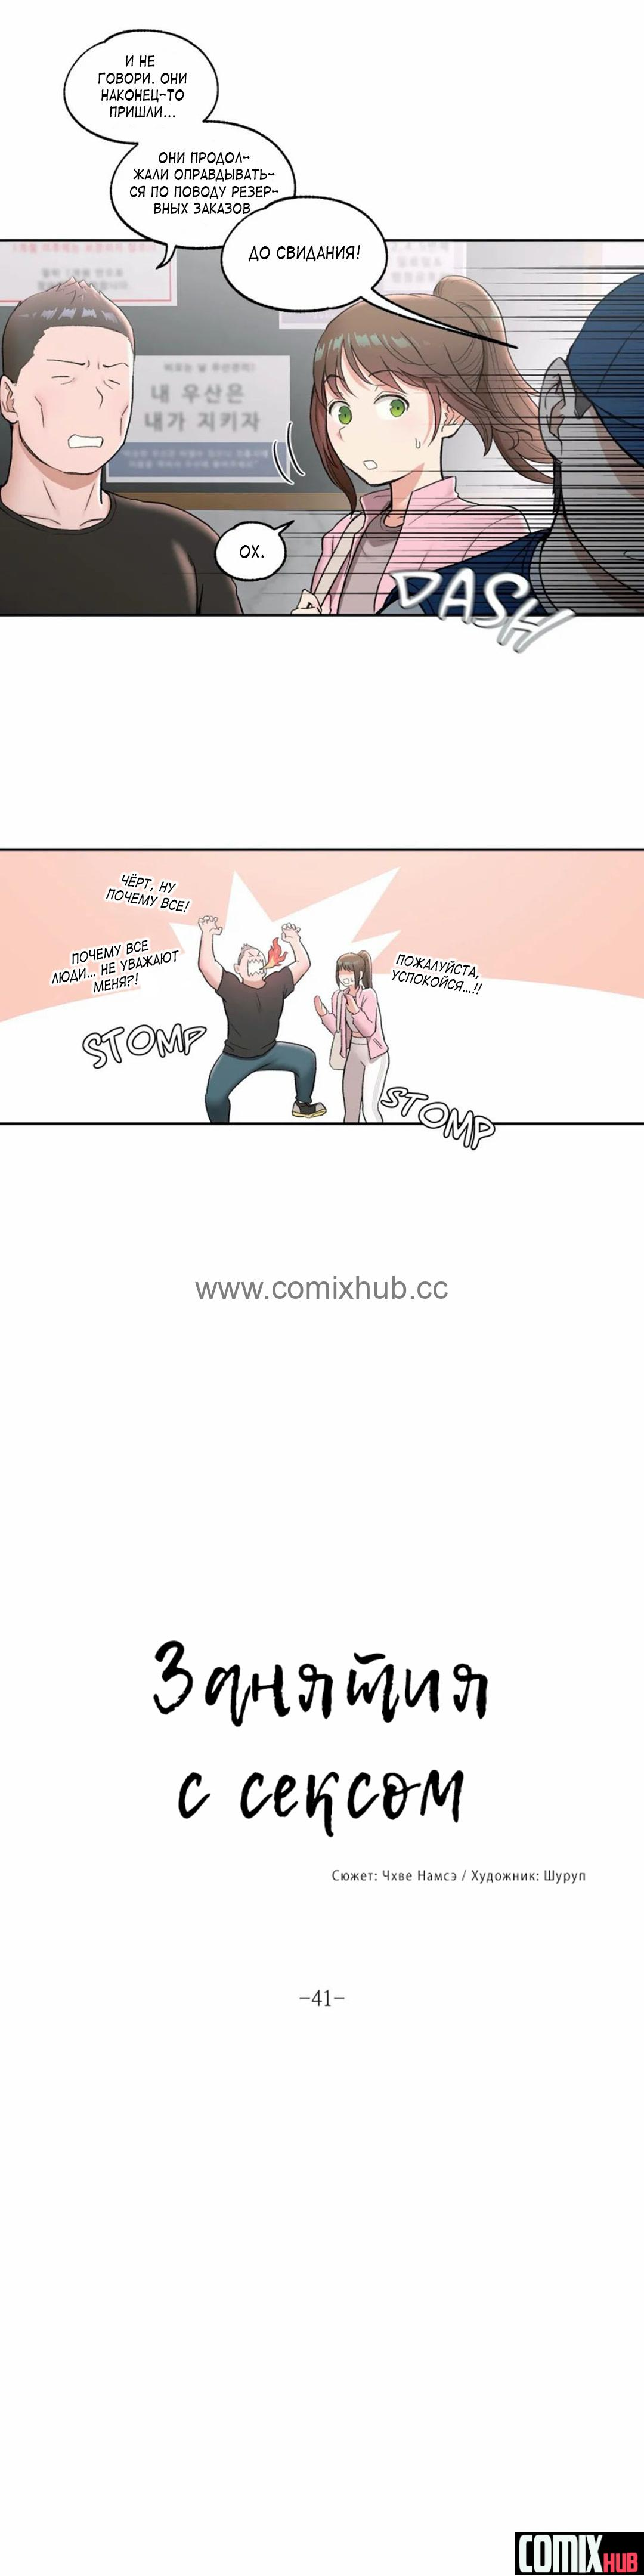 Манхва Занятия сексом, часть 41 Хентай манга, манхва, Большая грудь, Групповой секс, Измена